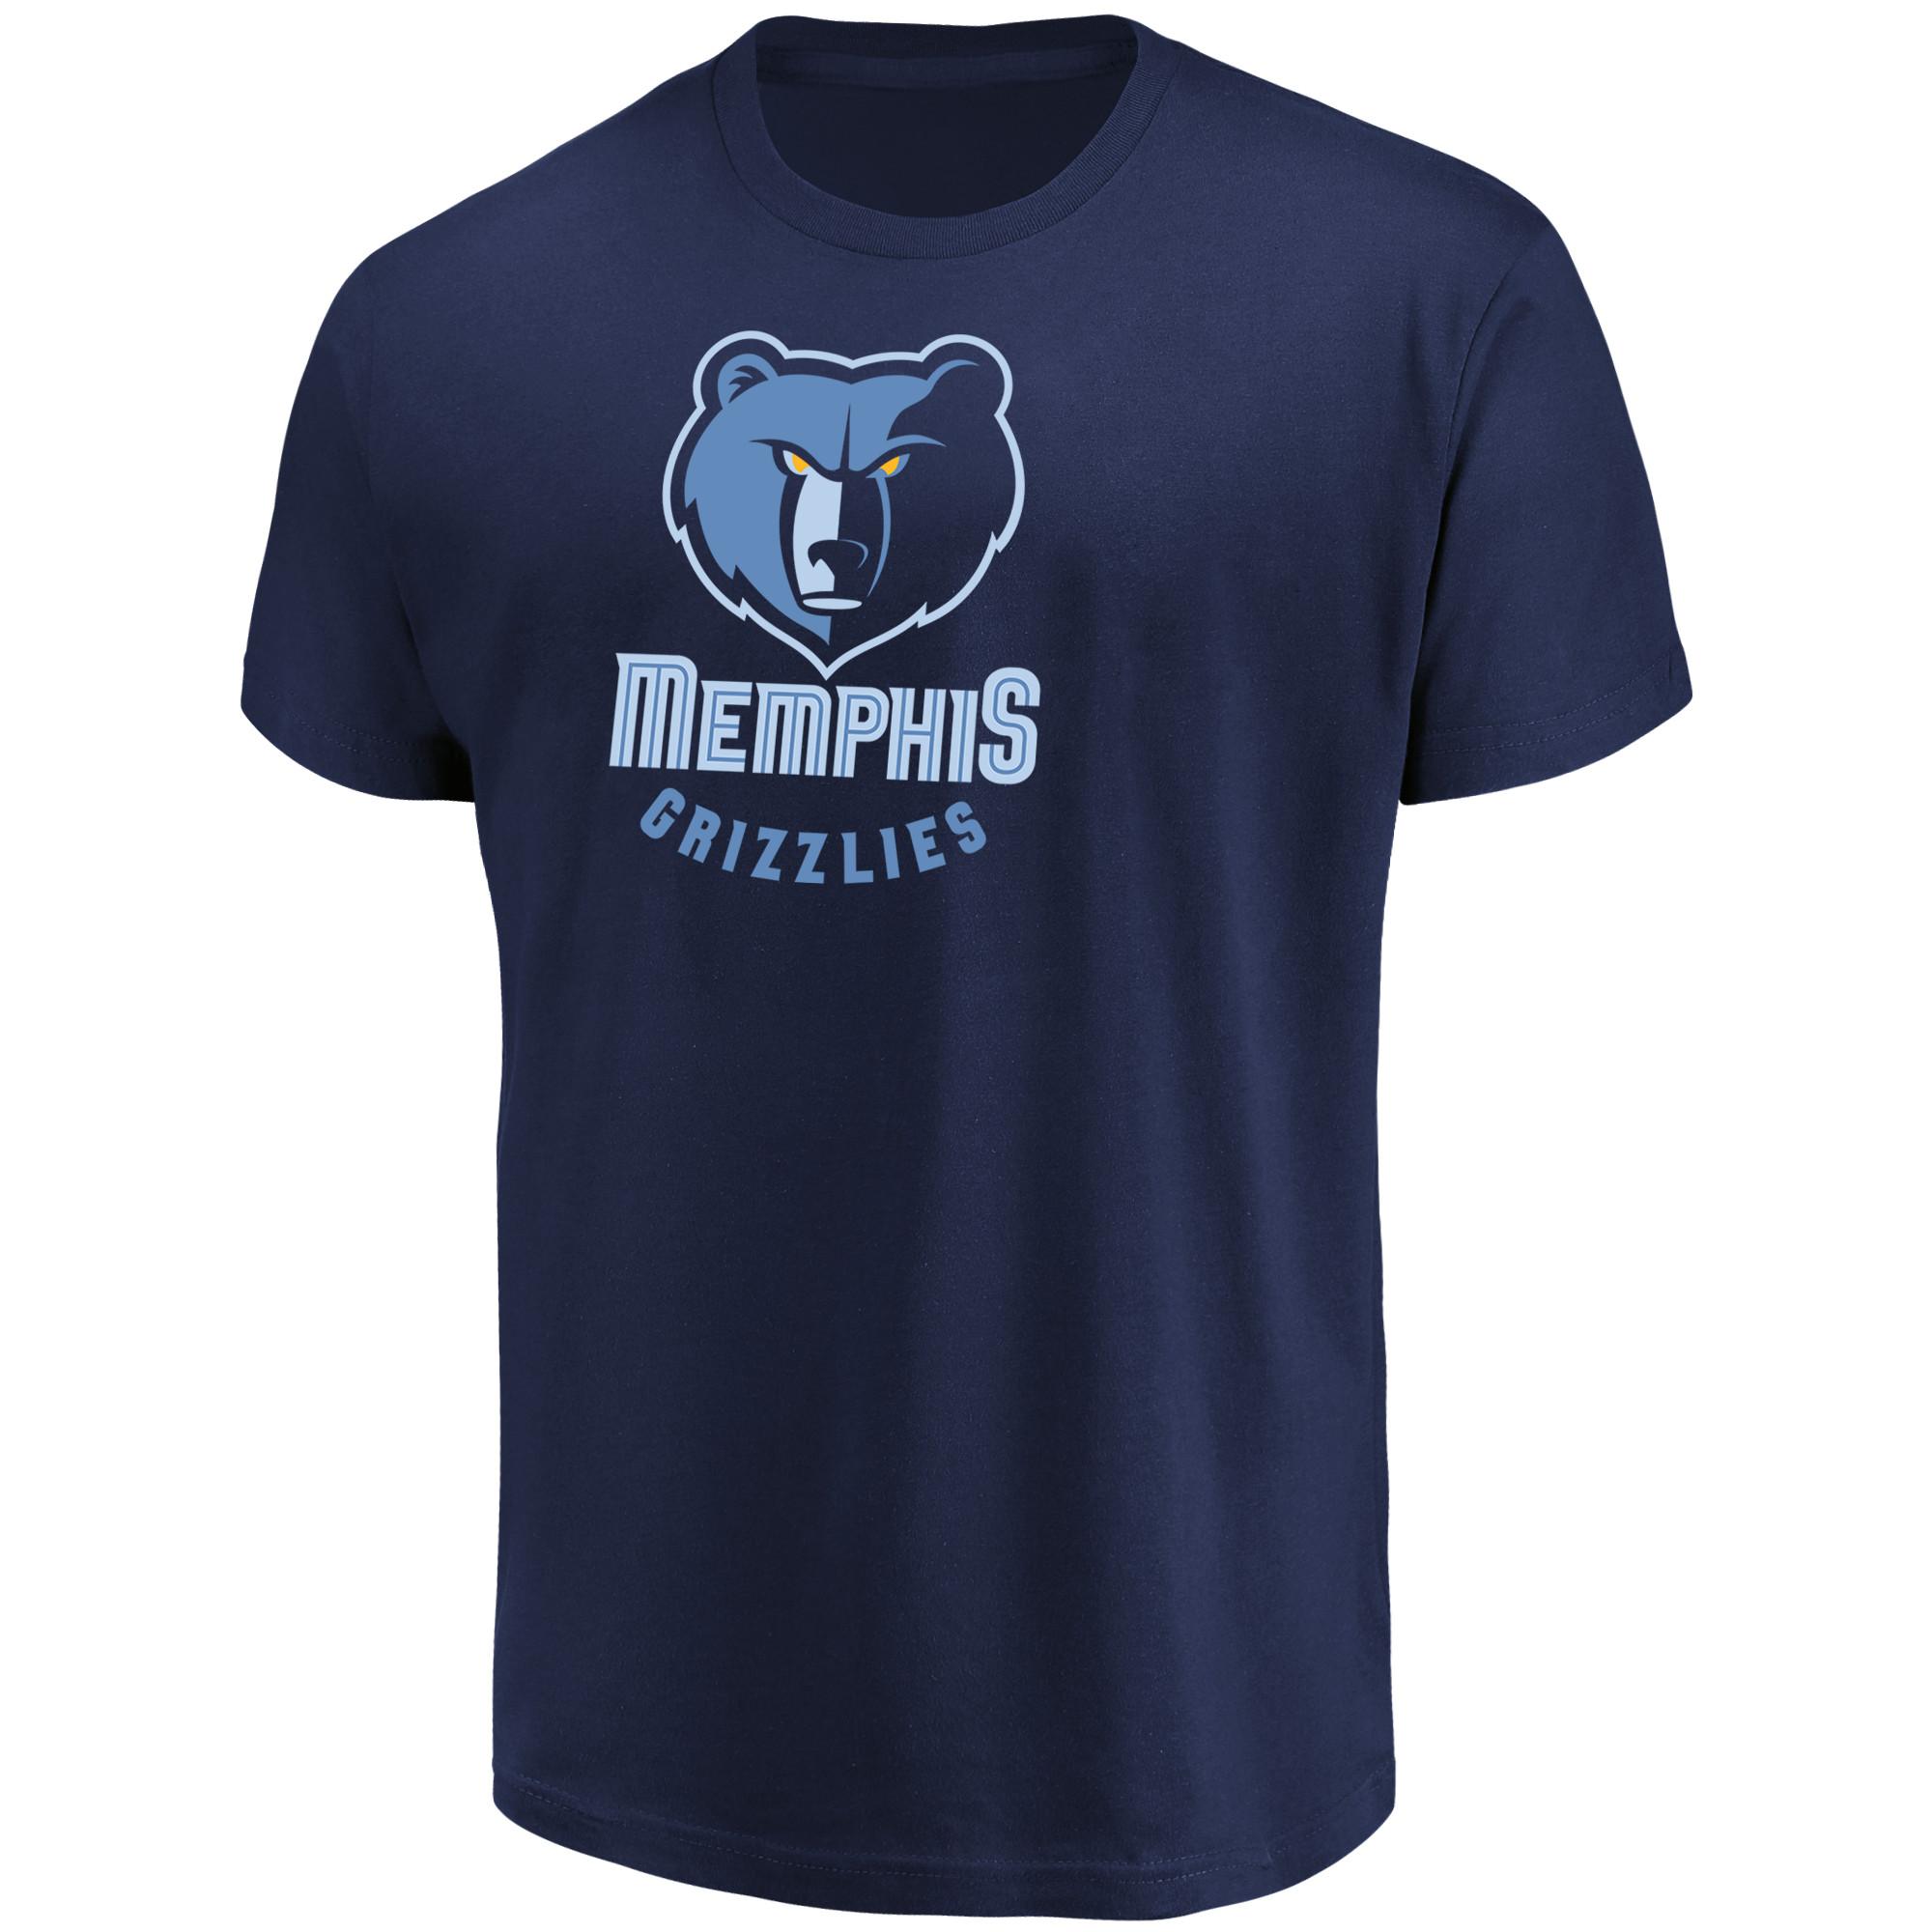 Men's Majestic Navy Memphis Grizzlies Victory Century T-Shirt